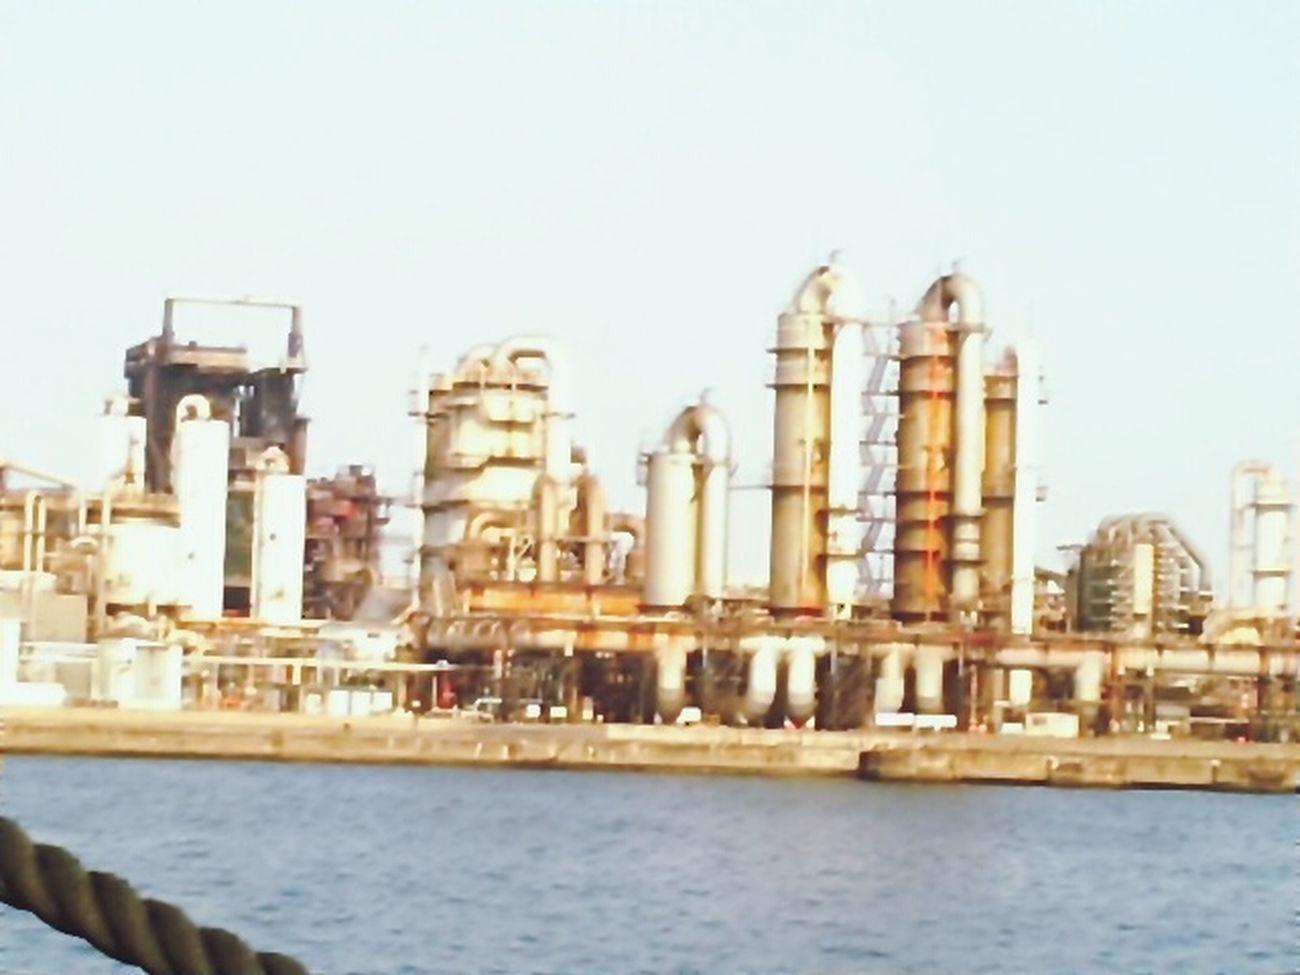 製鉄所。 Iron Work Factory Zone Factory Photo Factory Chiba Sea View Seaside